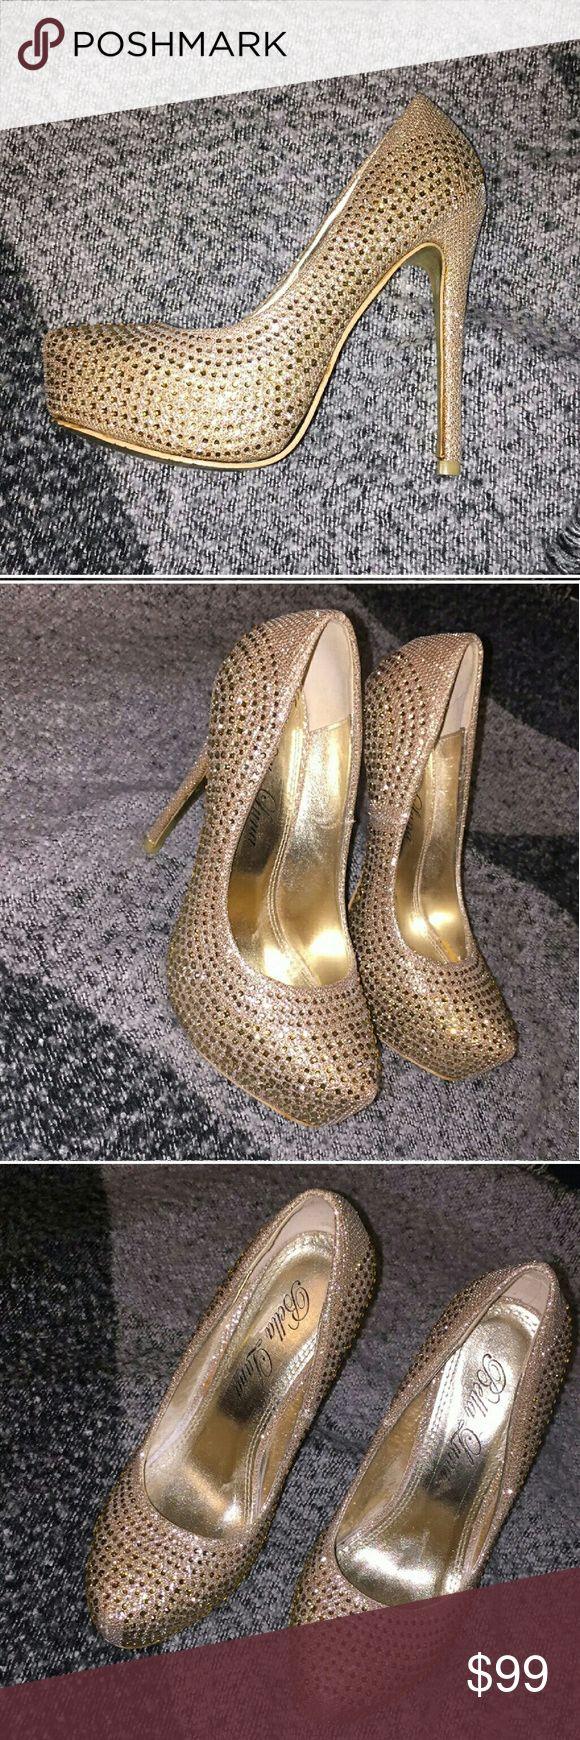 NAME YOUR PRICE! Bella Luna Jeweled Heels Worn once Excellent condition Size 7 bella luna Shoes Heels